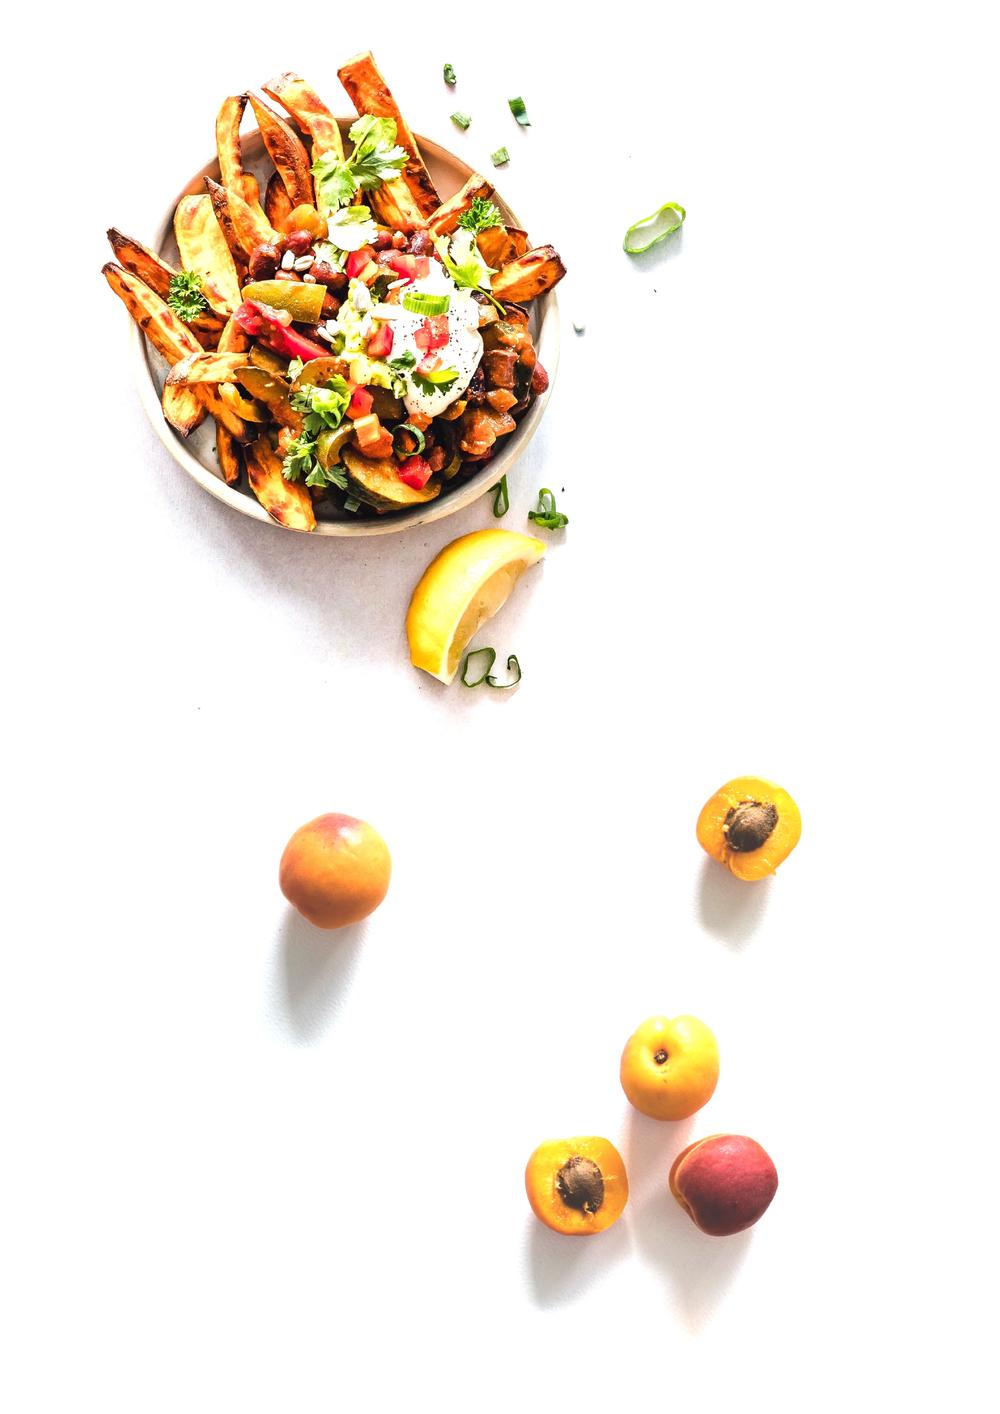 Food Image-05 copy.png